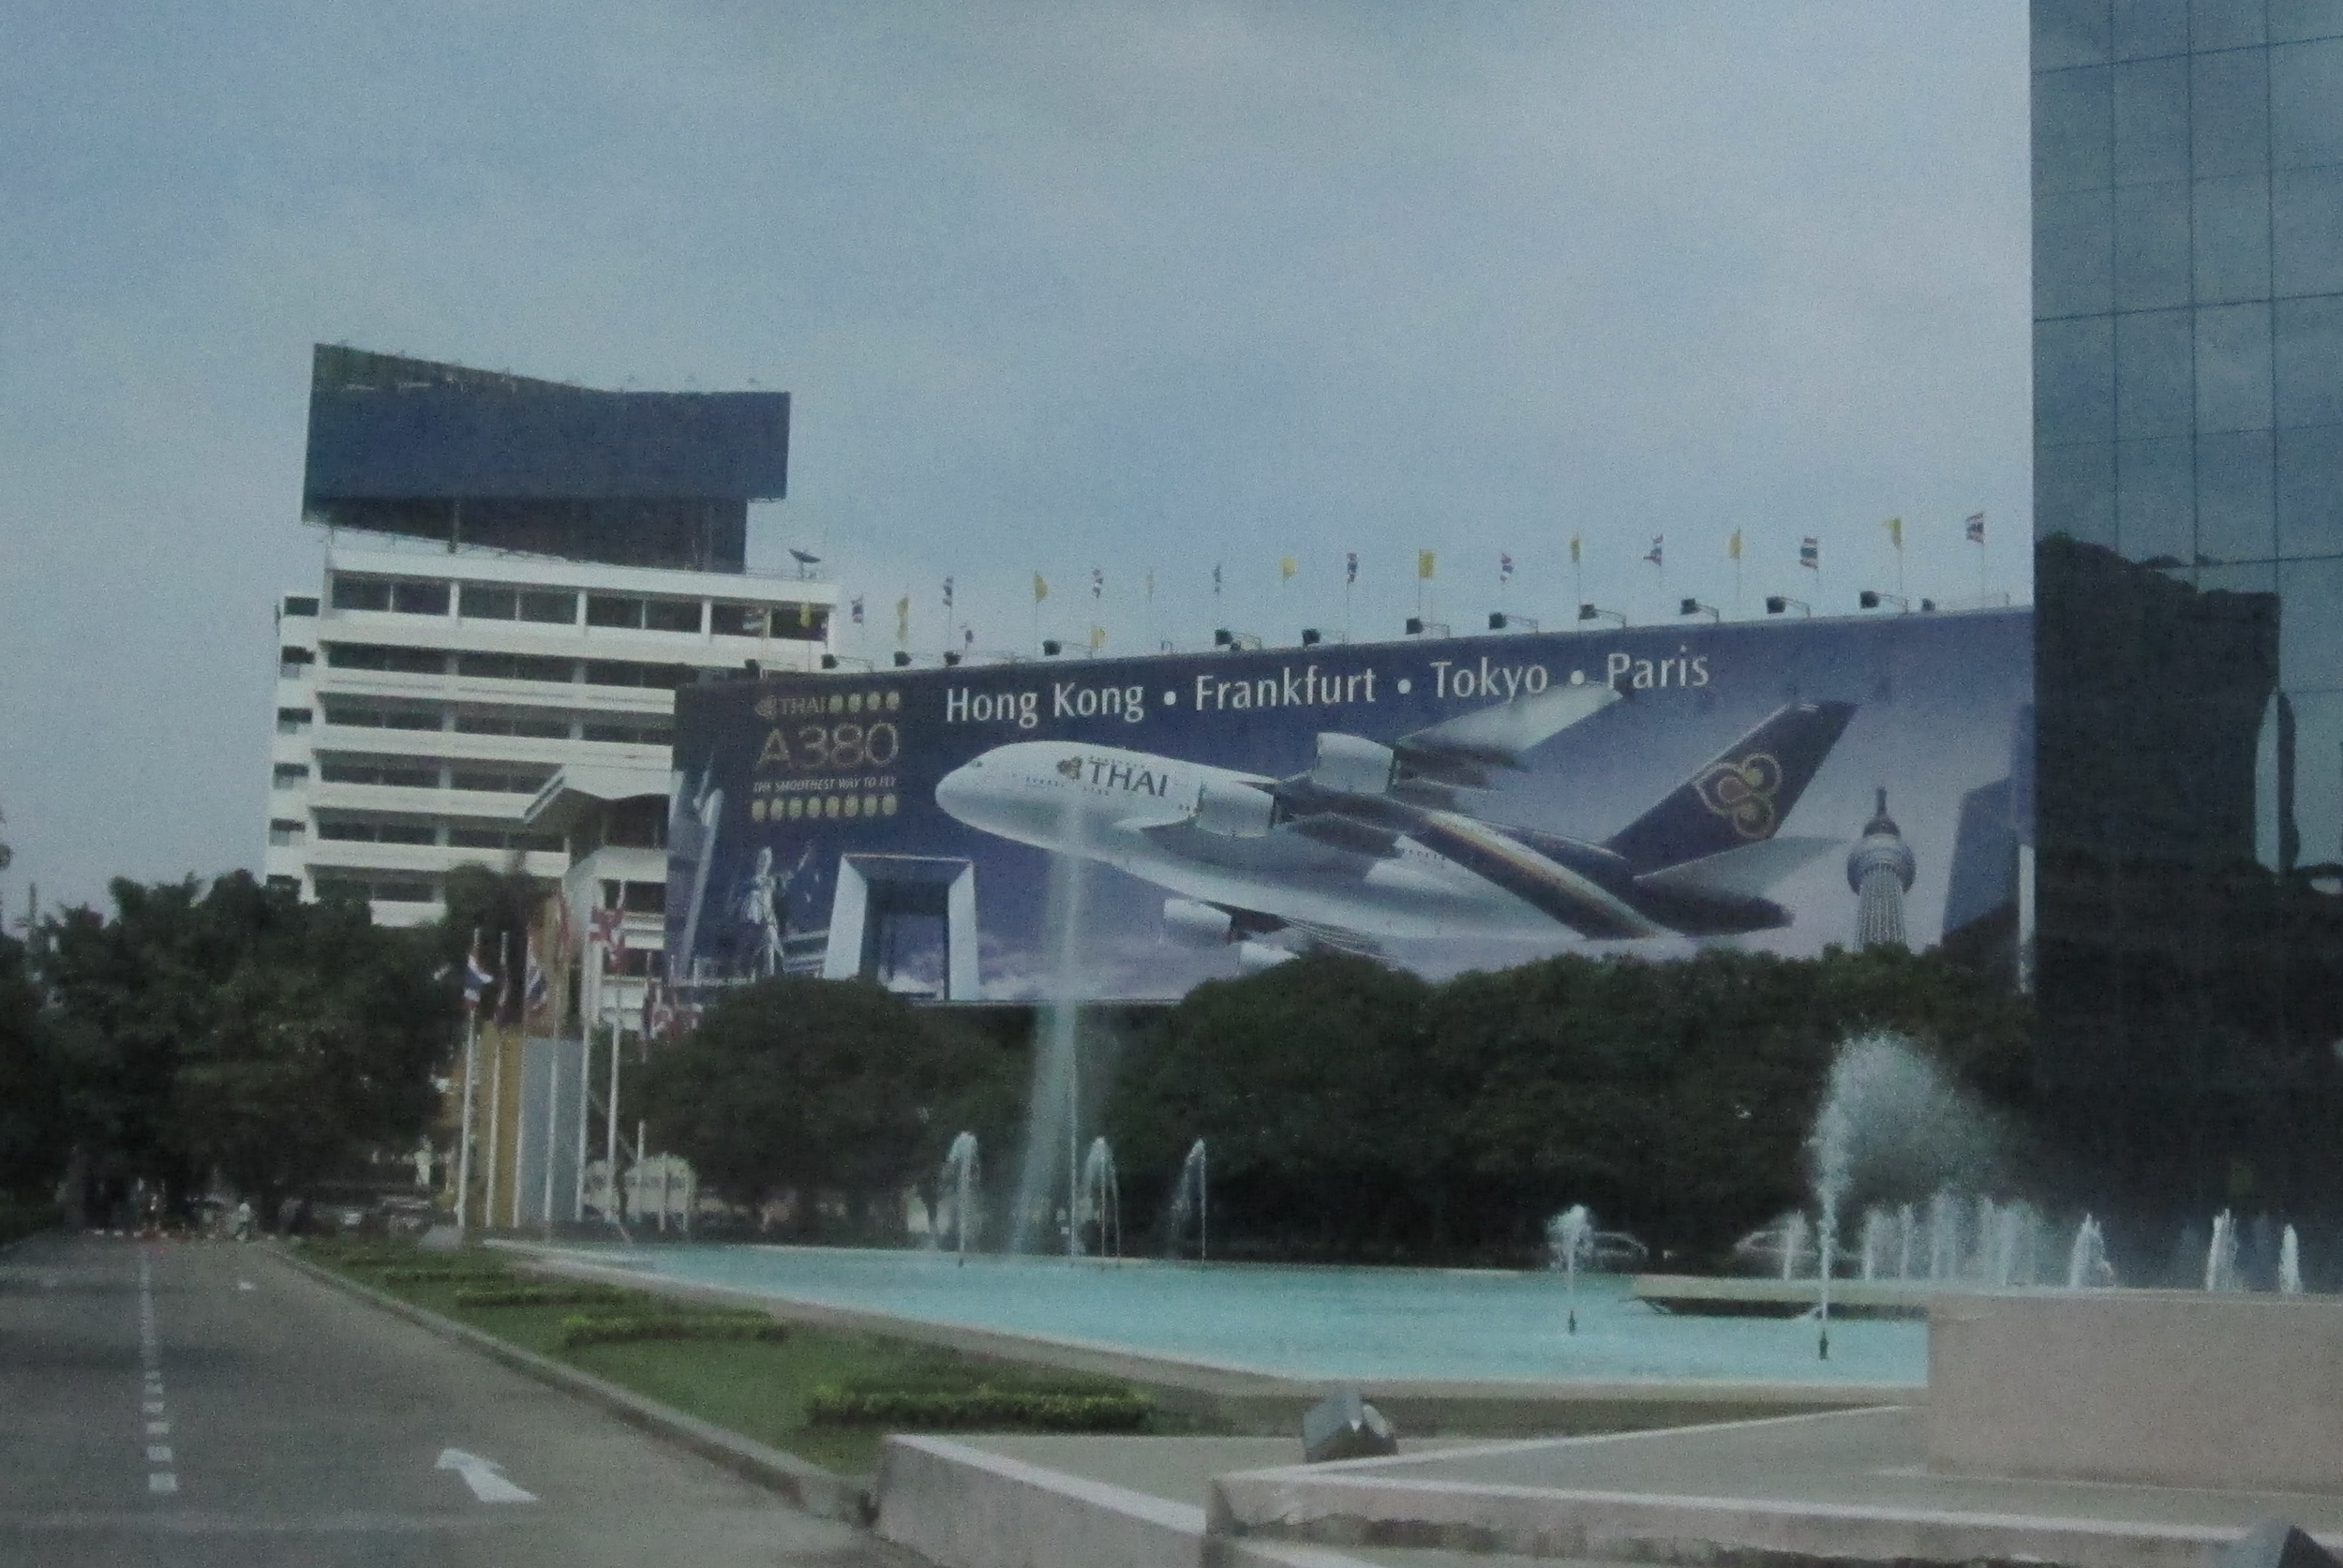 A familiar sight greeted us at Thai Airways' headquarters